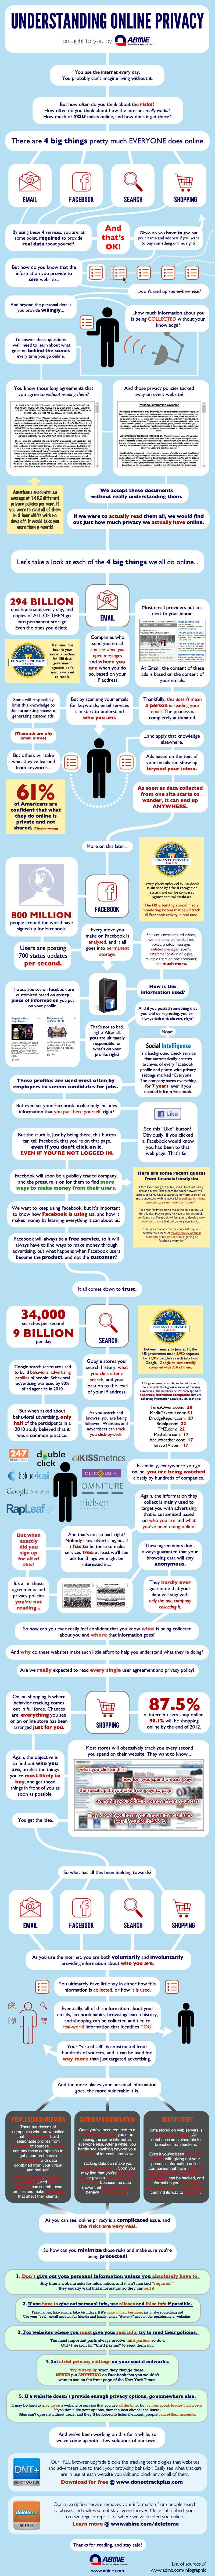 Abine_infographic